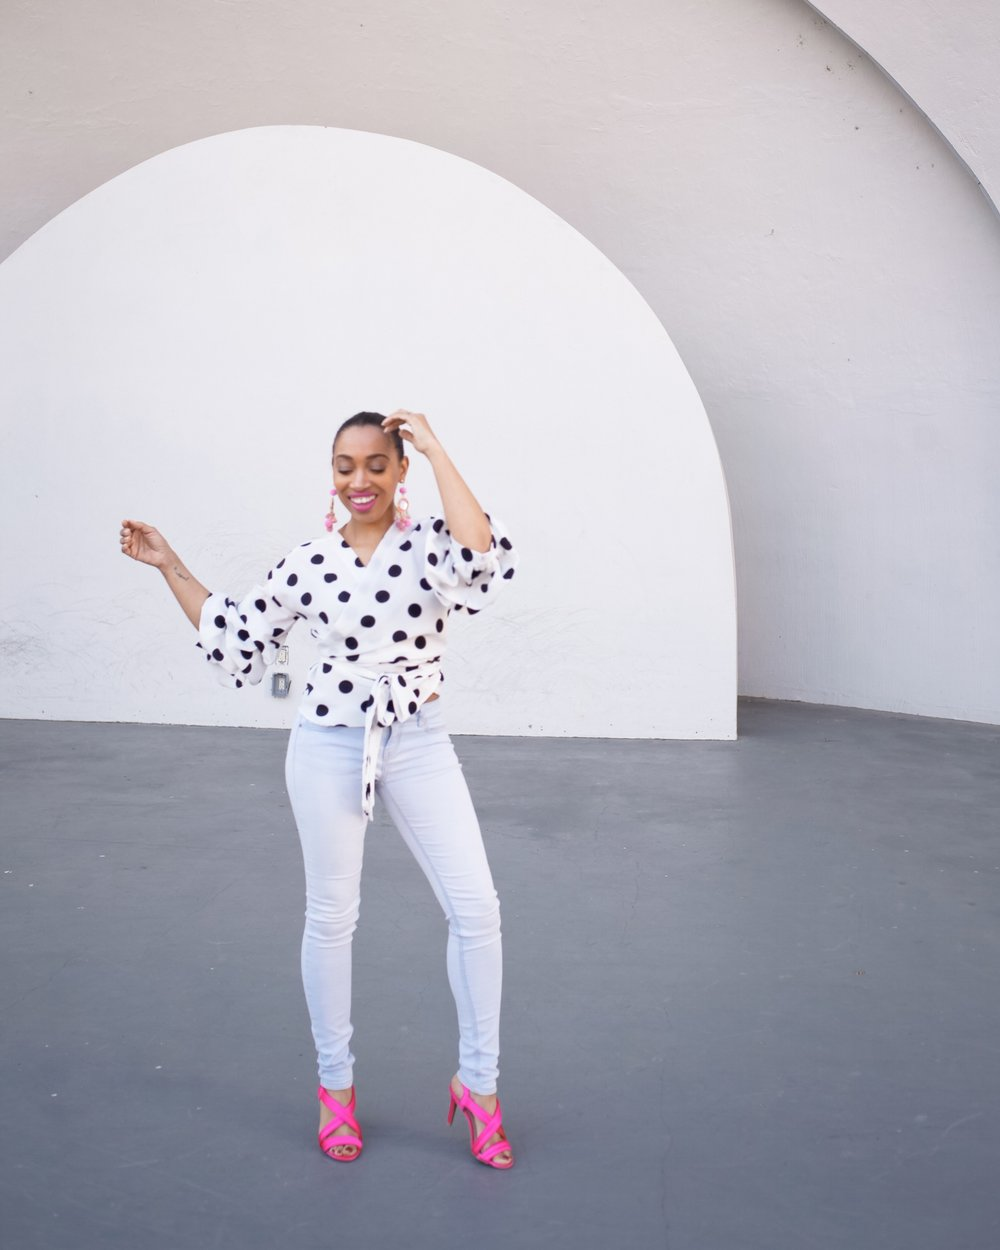 Andrea Fenise Memphis Fashion Blogger and Entrepreneur